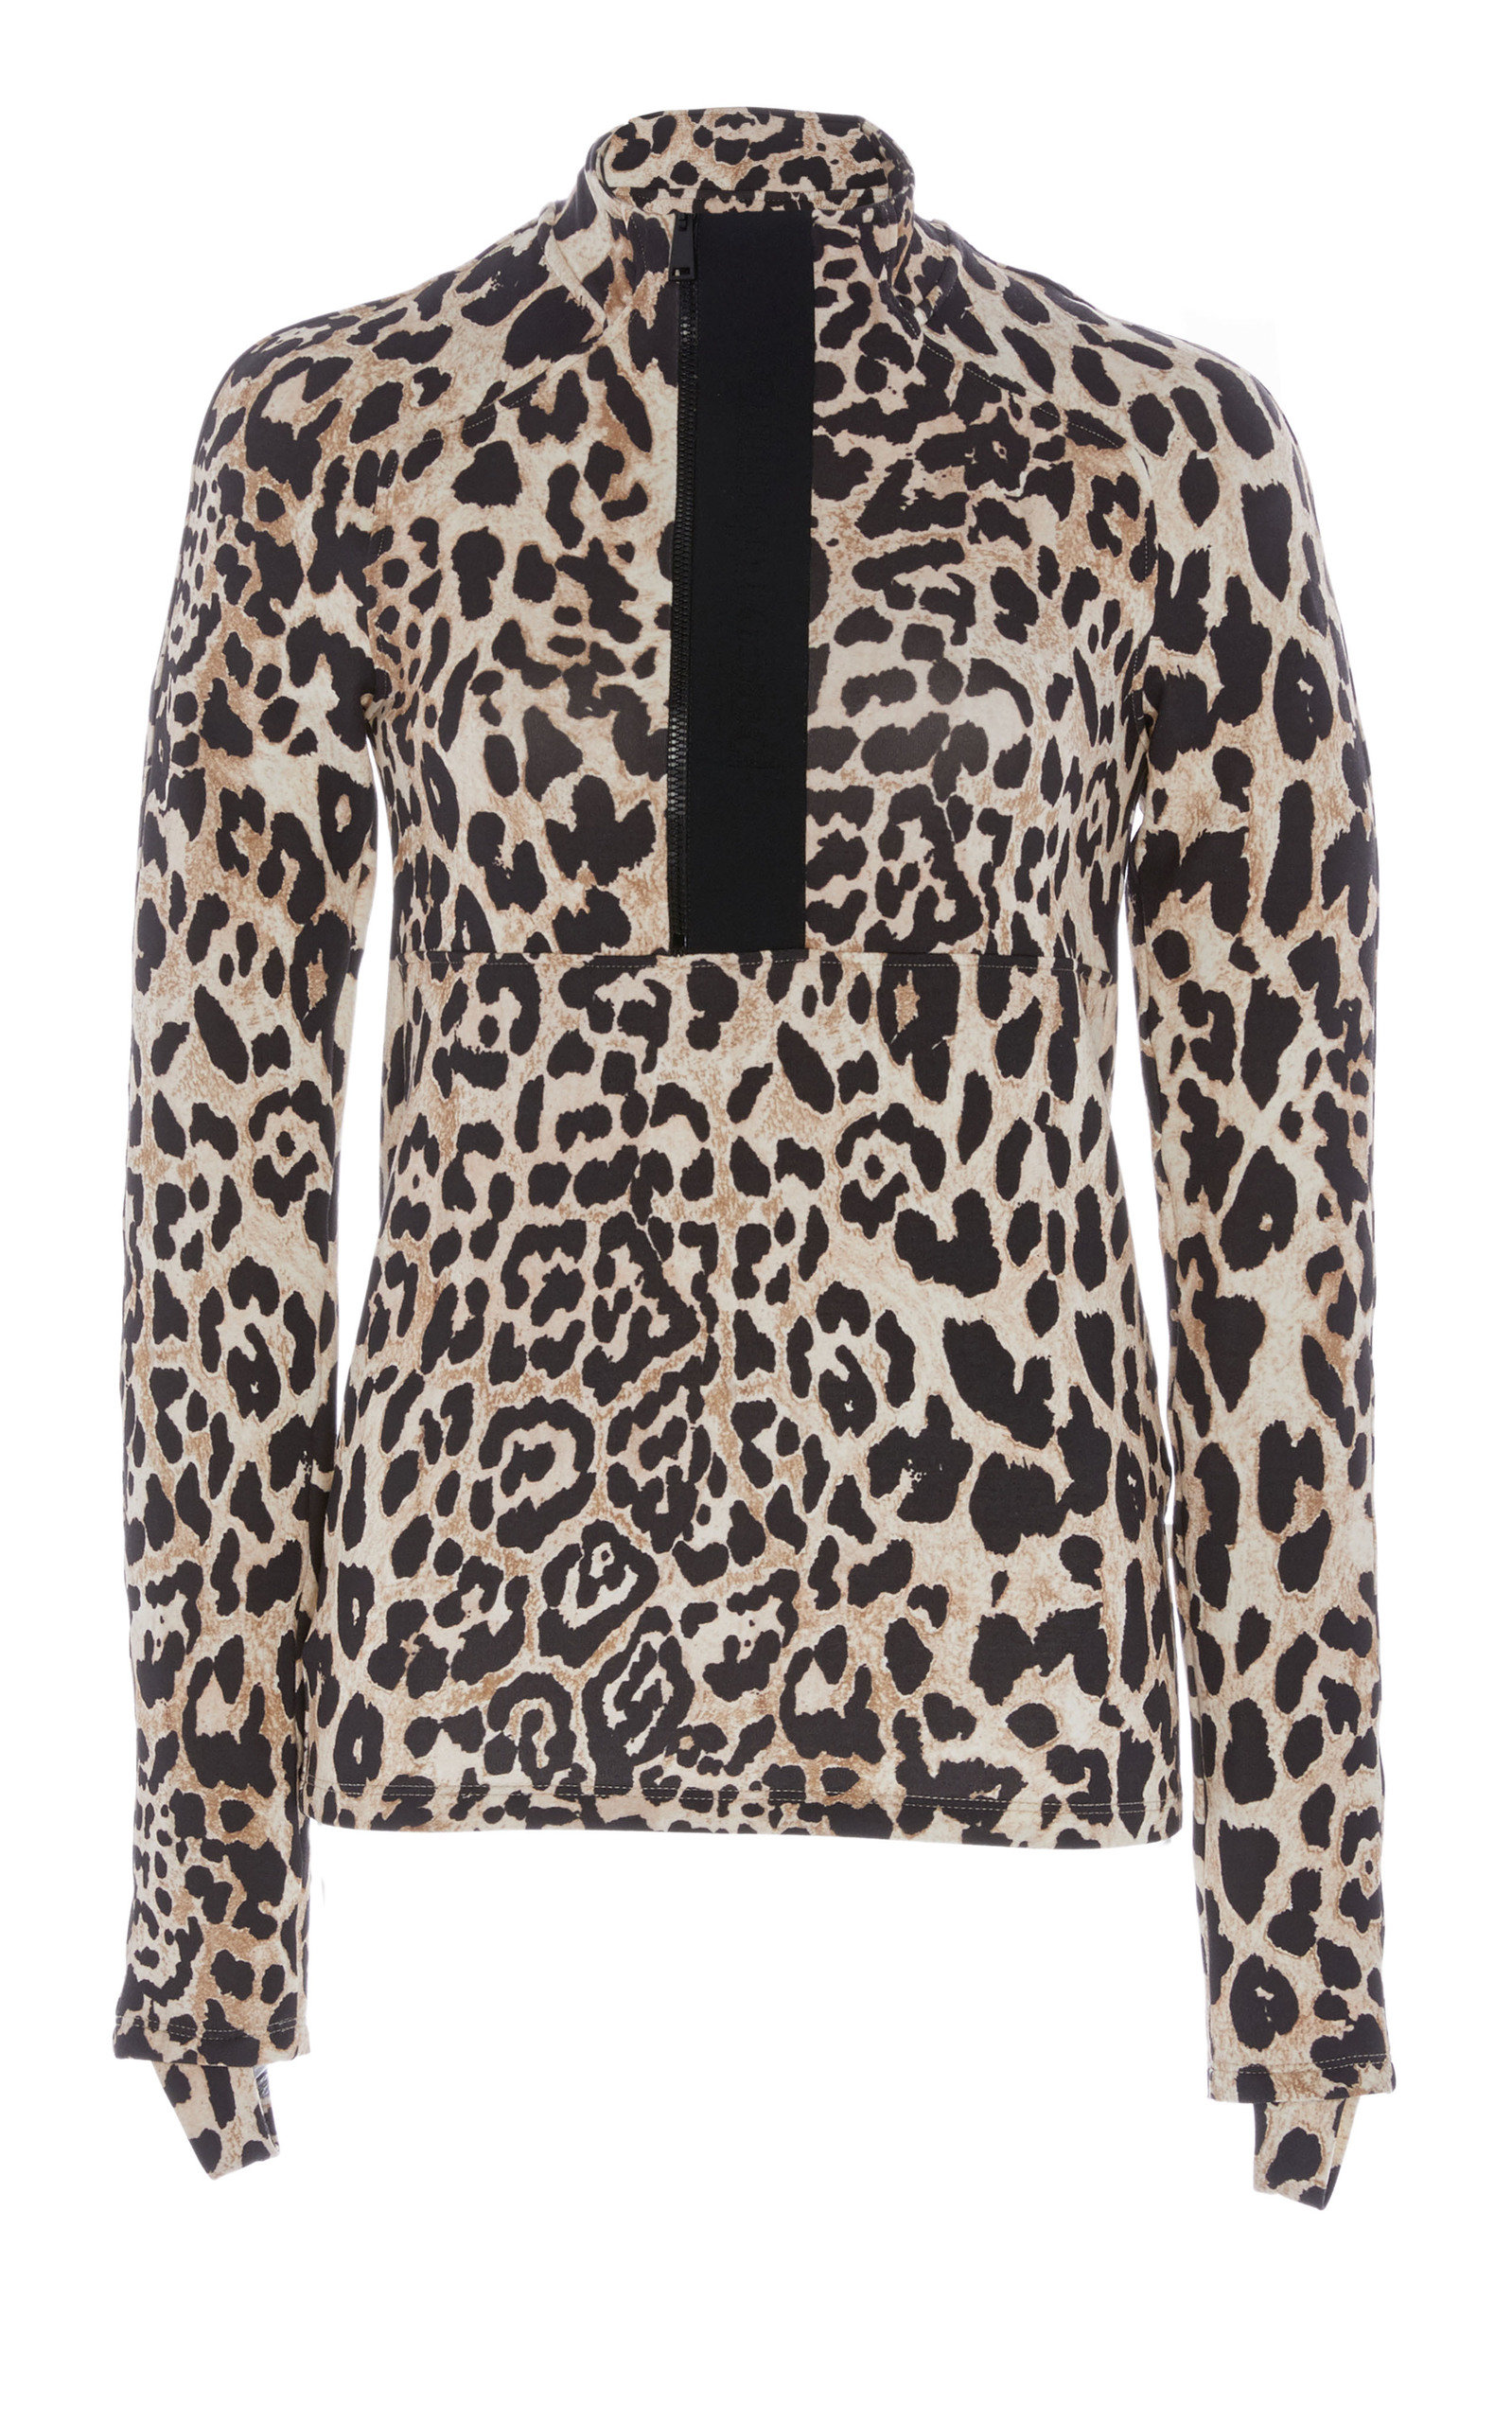 053fbcd5 Band Collar Leopard Blouse by Paco Rabanne | Moda Operandi